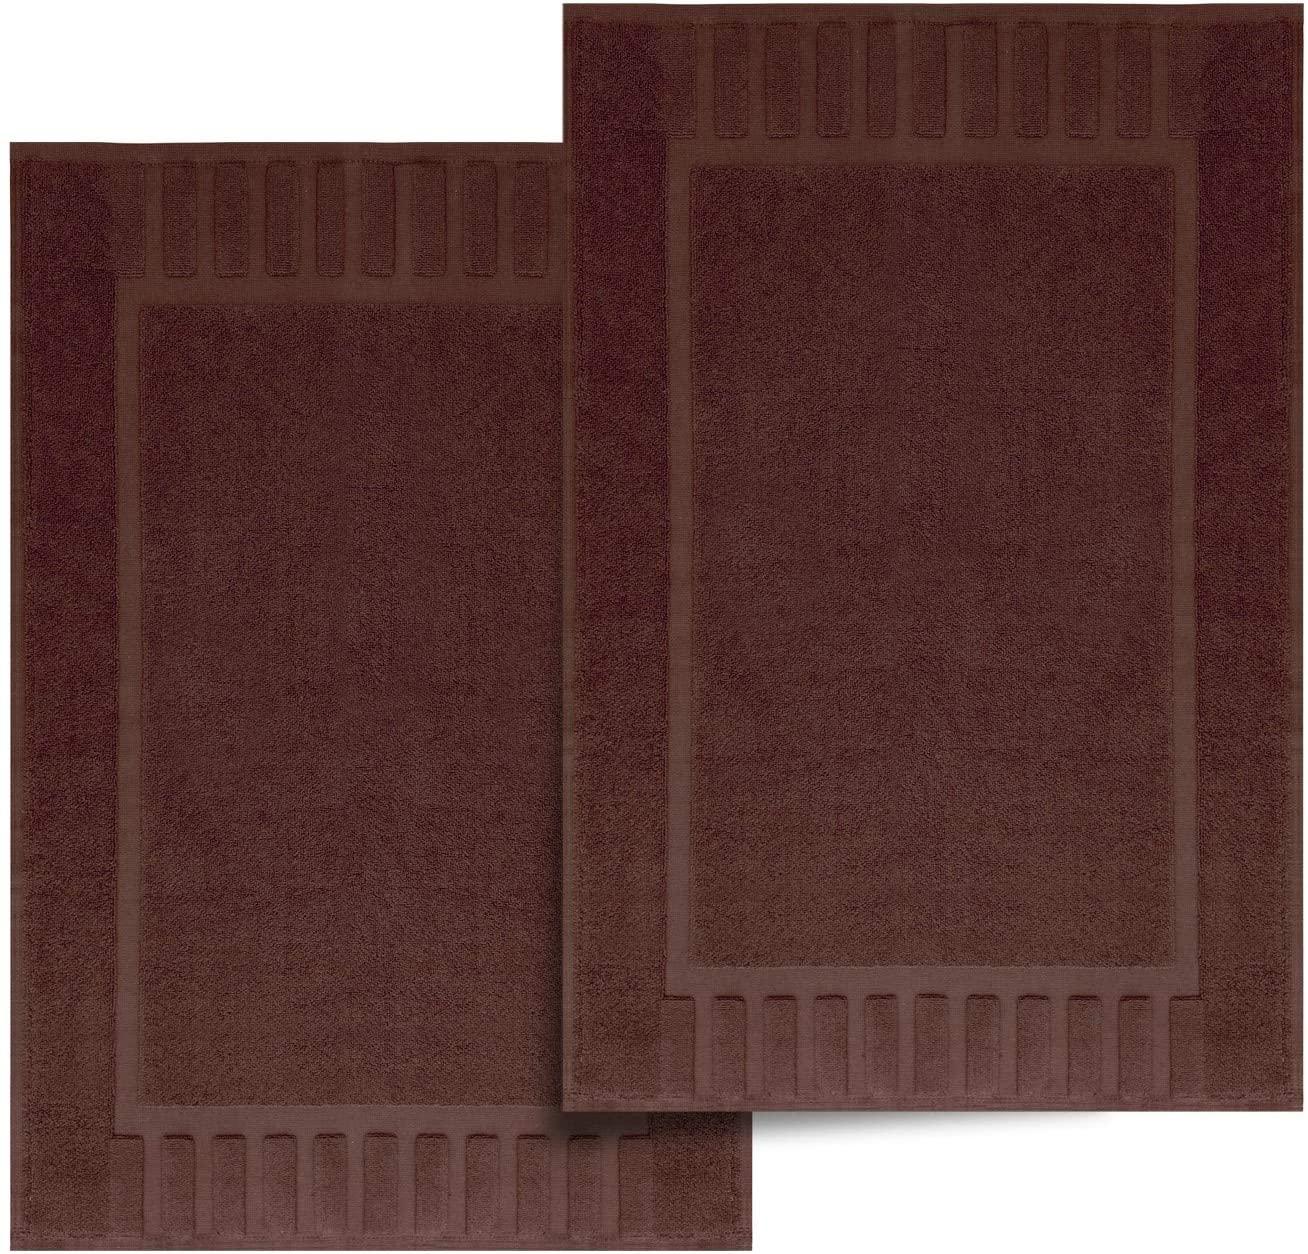 White Classic Luxury Bath Mat Floor Towel Set - Absorbent Cotton Hotel Spa Shower/Bathtub Mats [Not a Bathroom Rug] 22